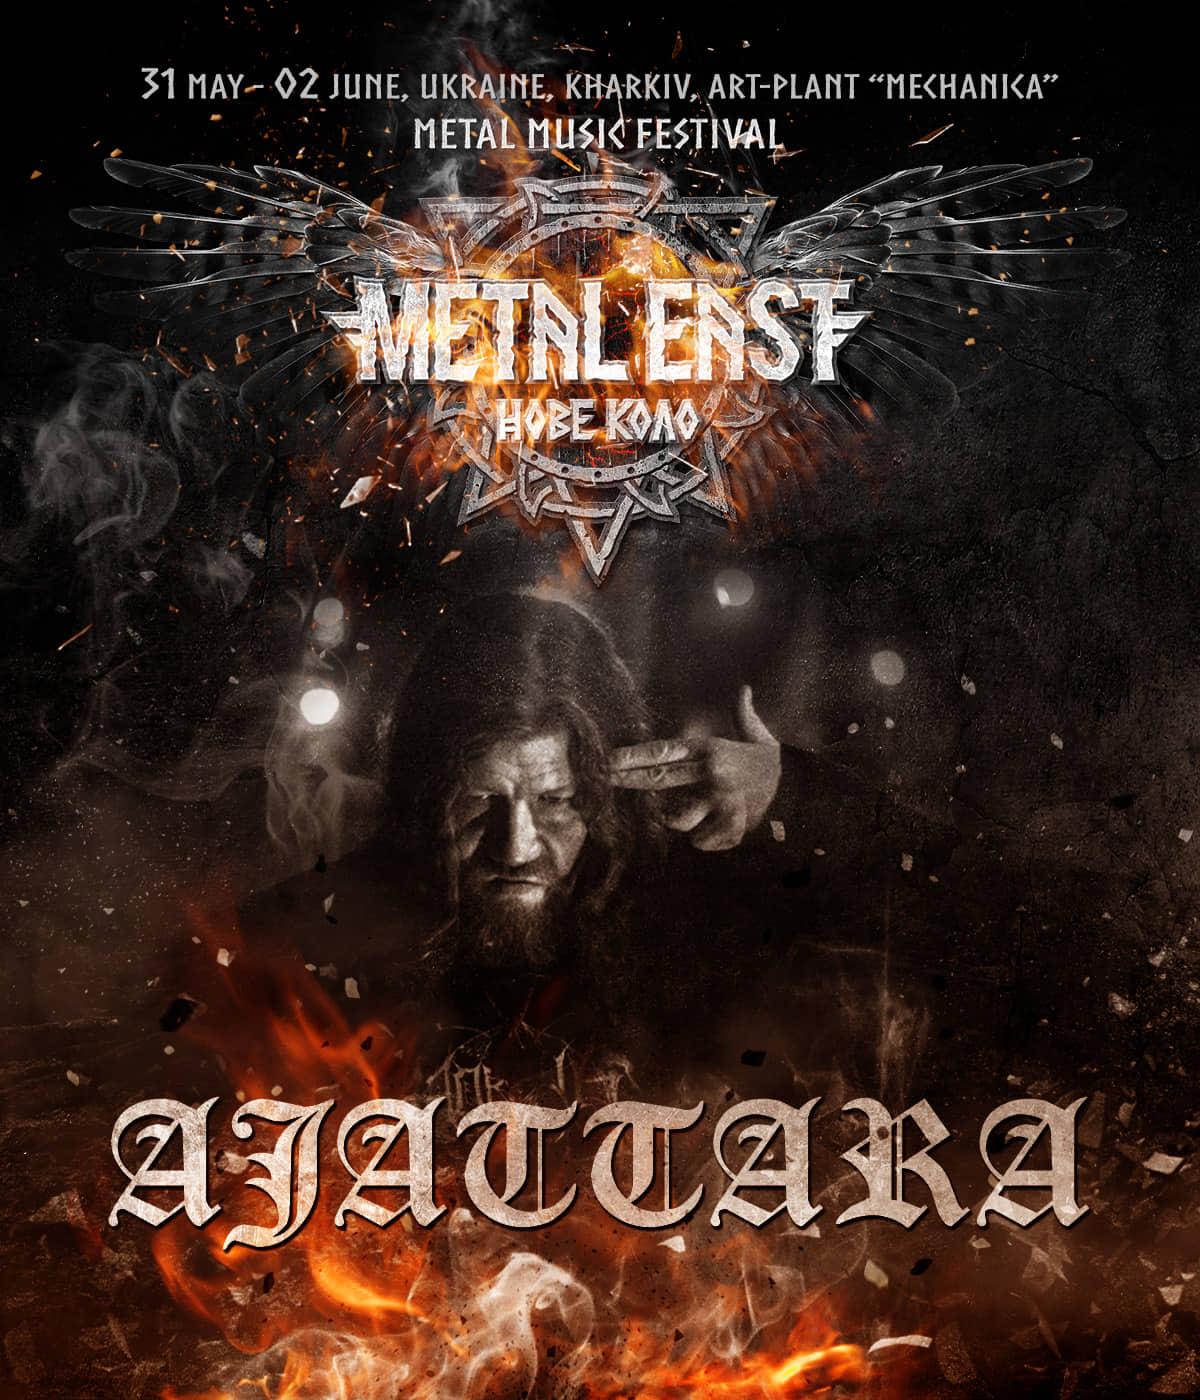 From May 31st to June 2nd of 2019 AJATTARA at Metal East Nove Kolo festival in Kharkiv, Ukraine.